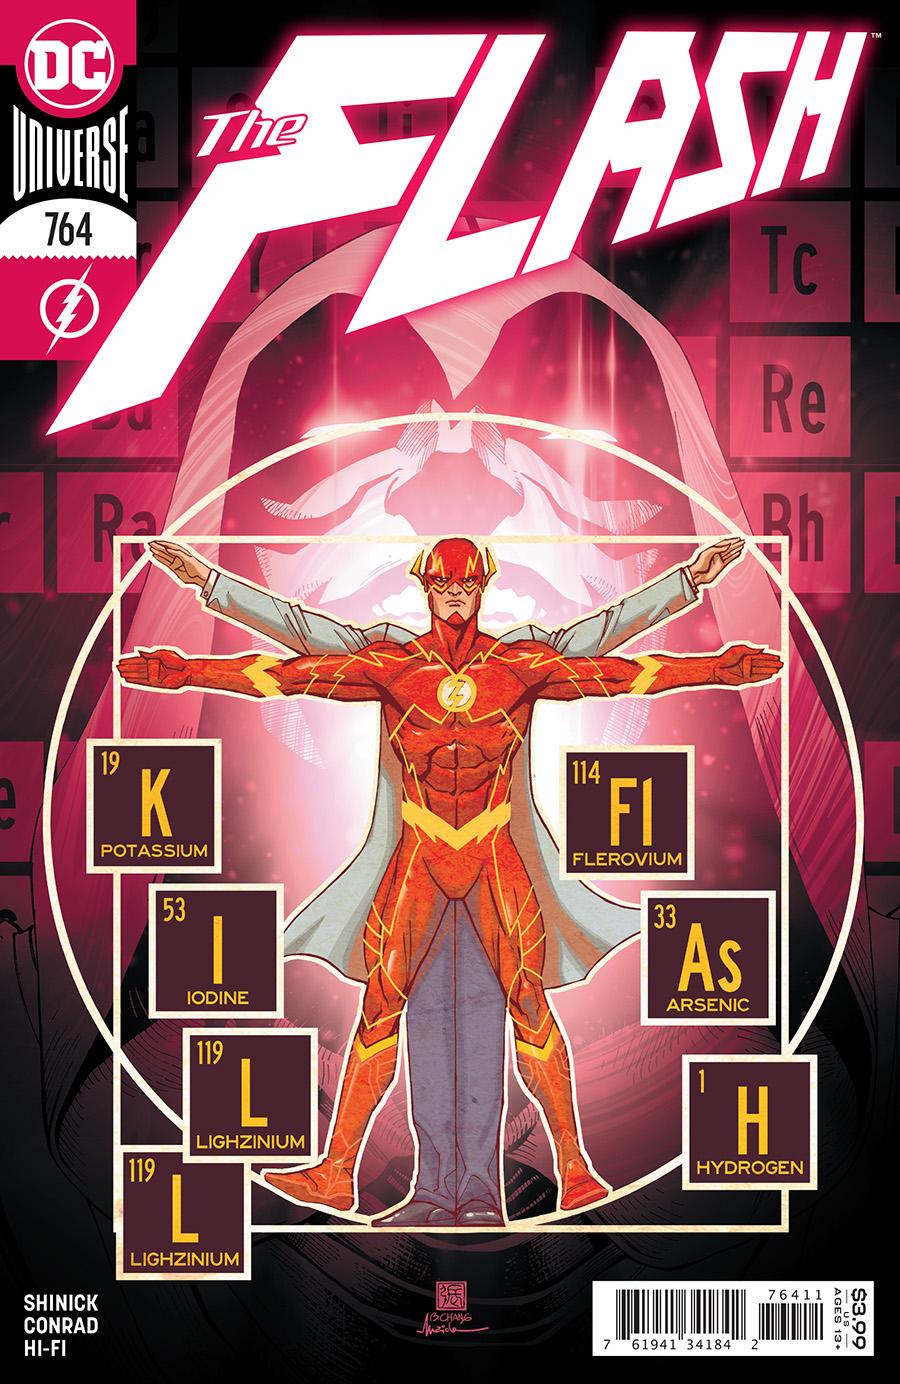 Flash Vol 1 #764 Cover A Bernard Chang